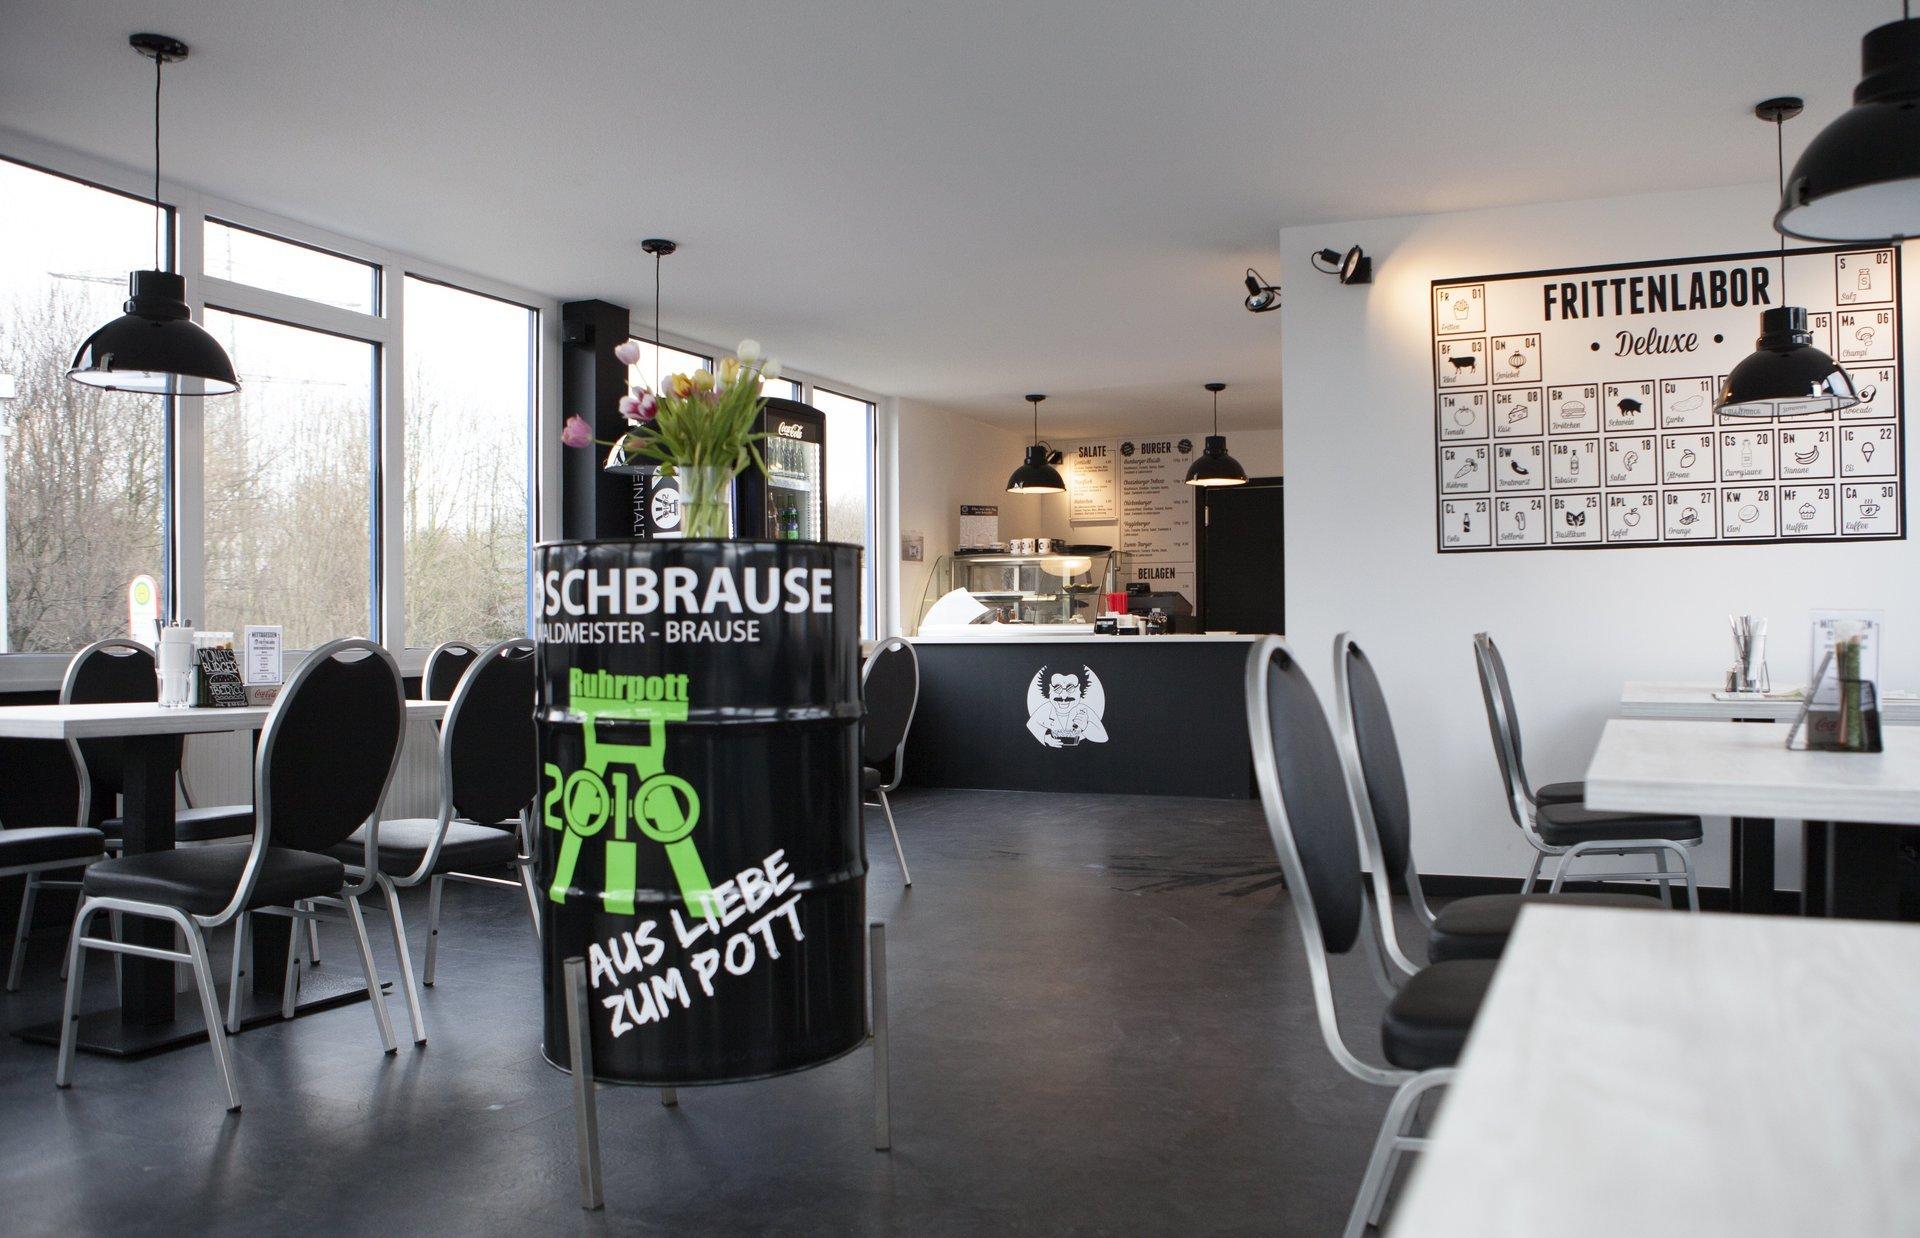 Frittenlabor-Deluxe in Dortmund